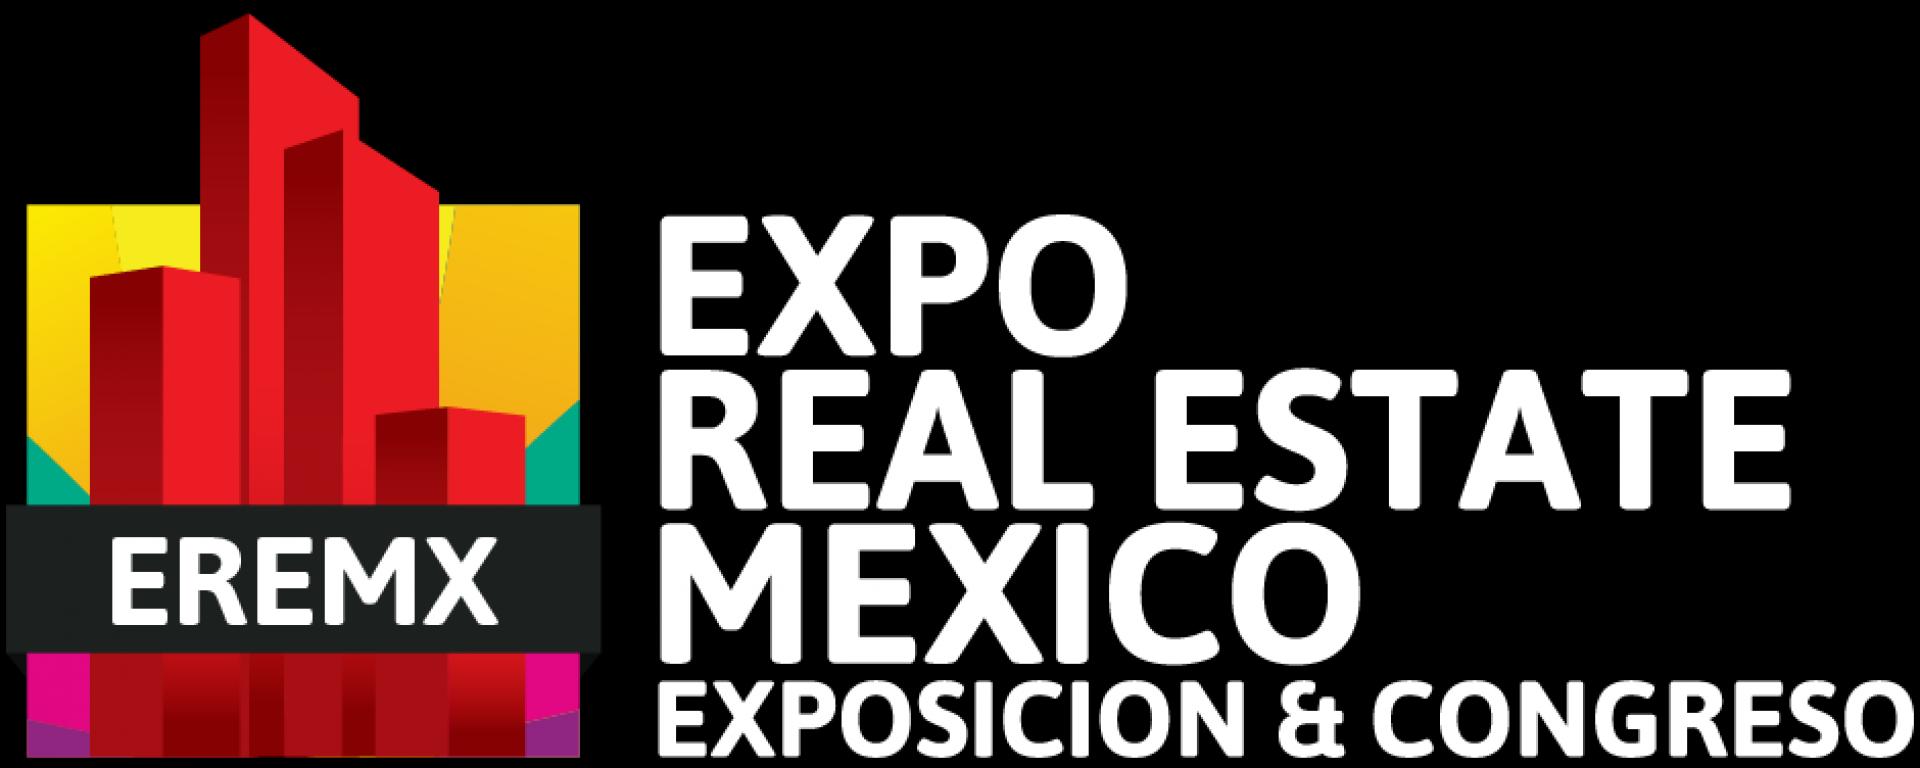 EXPO REAL ESTATE MEXICO (EREMX)